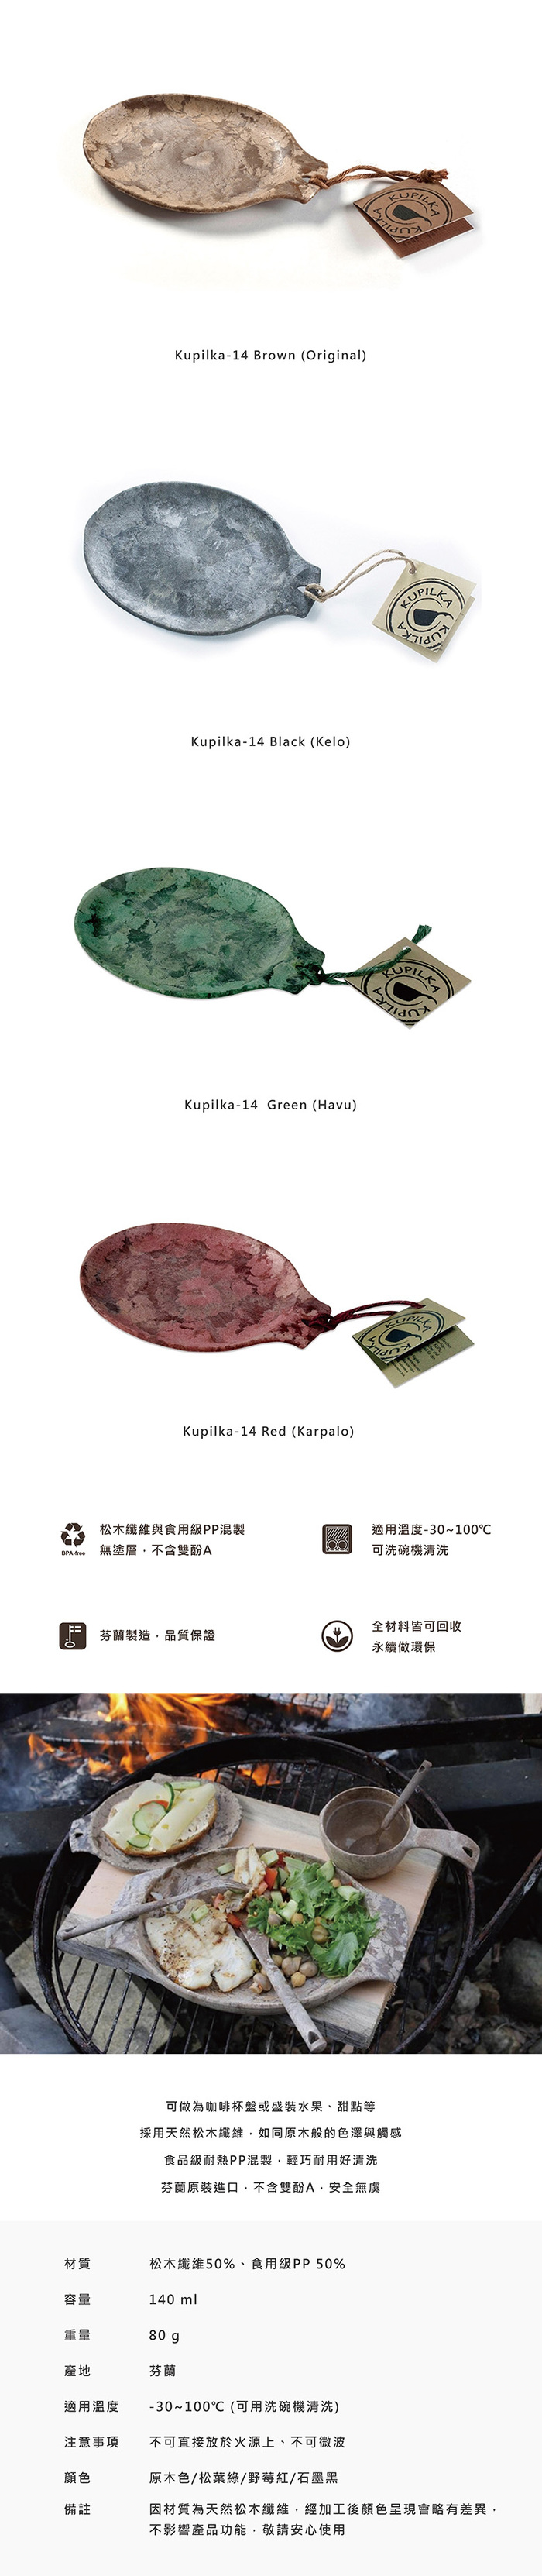 KUPILKA 14號松木餐盤(小)